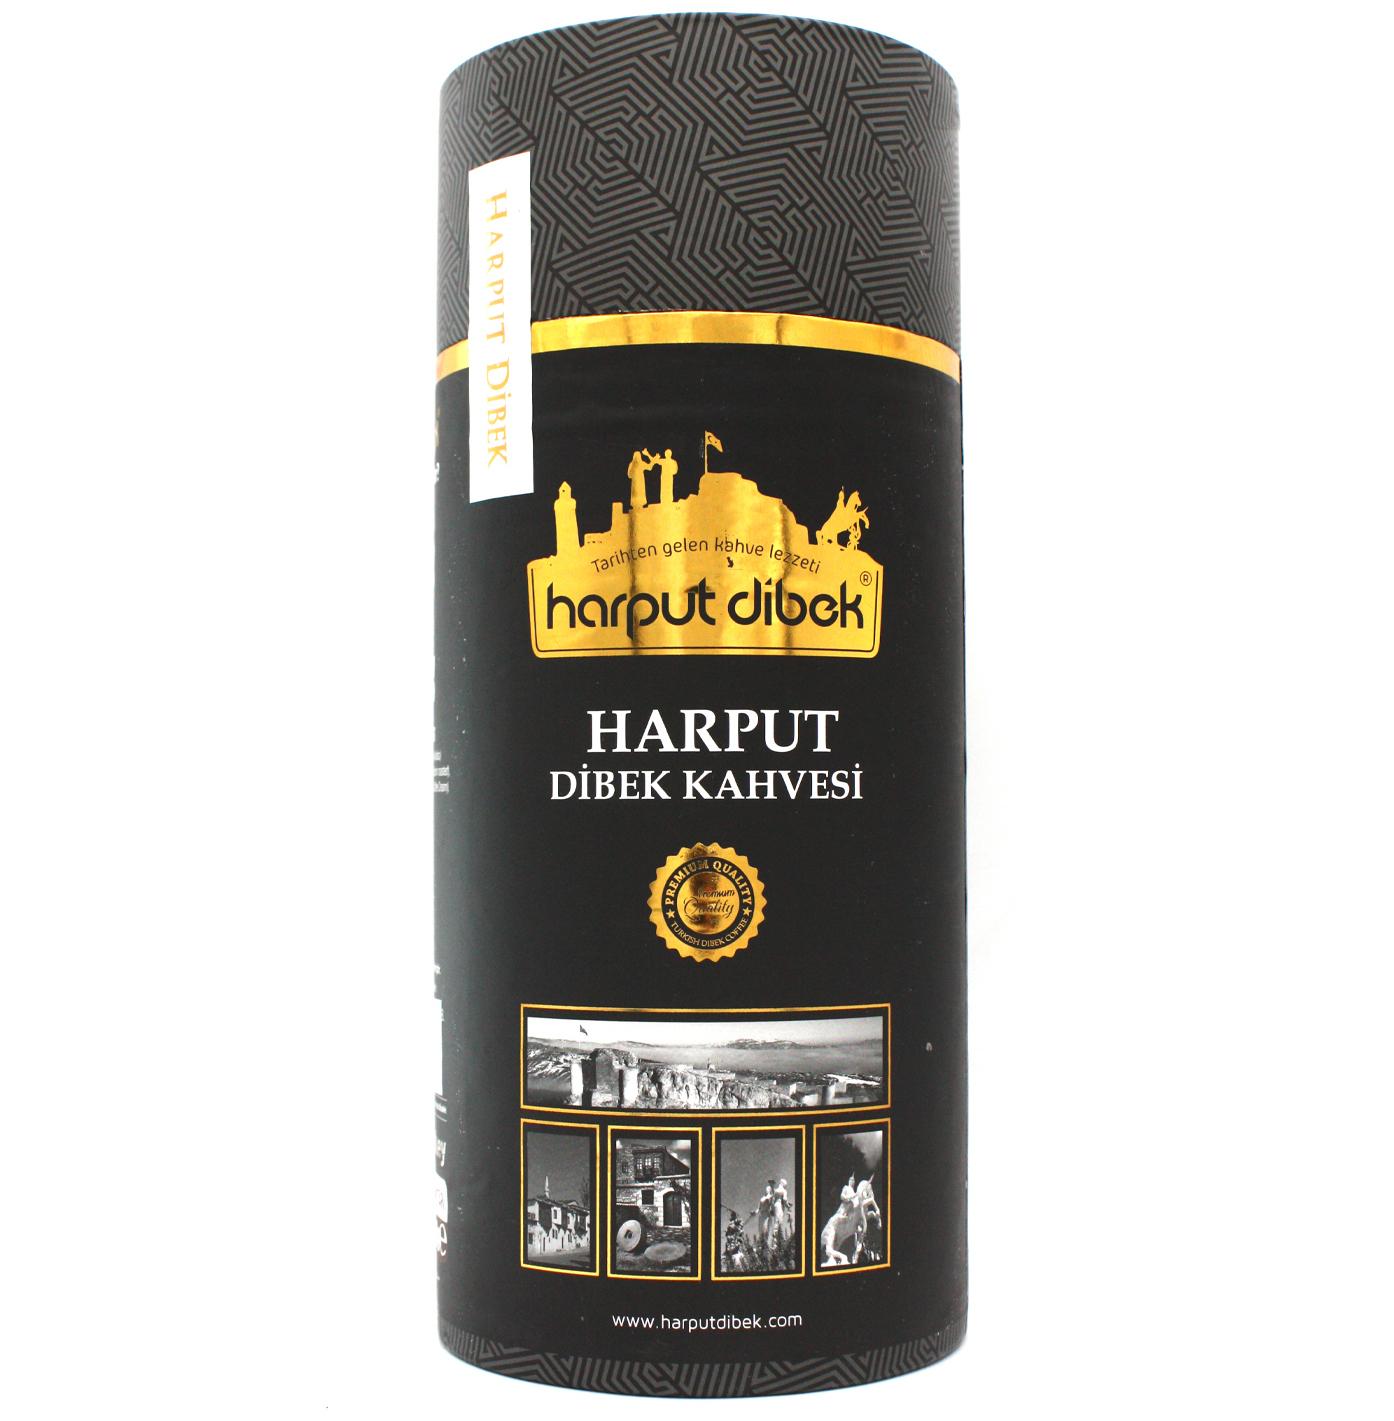 Турецкий кофе Harput Dibek Kahvesi, Harput Dibek, 1 кг import_files_40_40f06b1369be11e9a9ac484d7ecee297_40f06b1669be11e9a9ac484d7ecee297.jpg